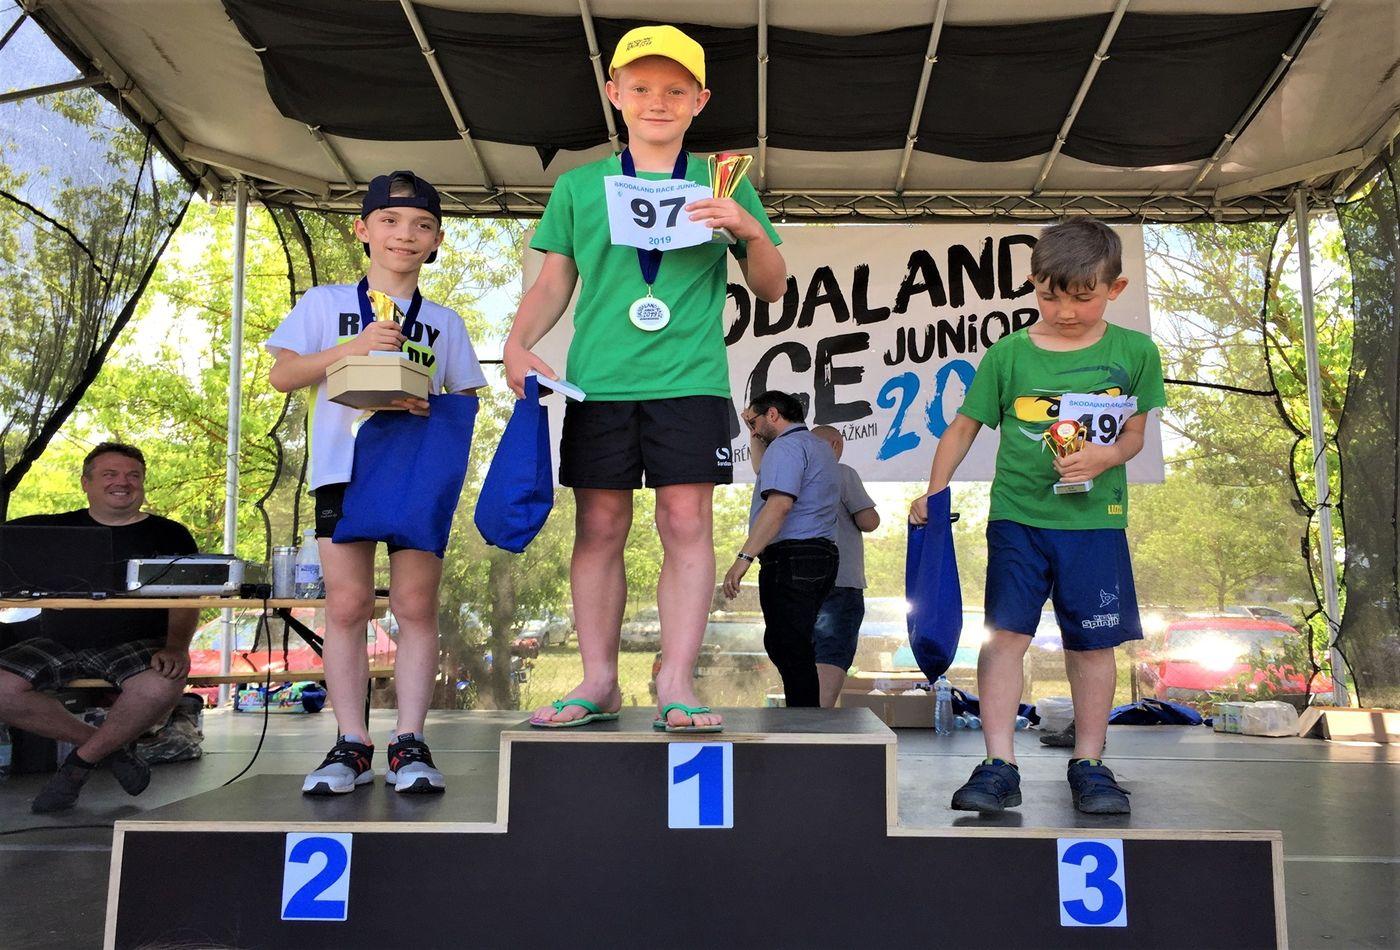 Foto-Škodaland-Race-Junior_6-306